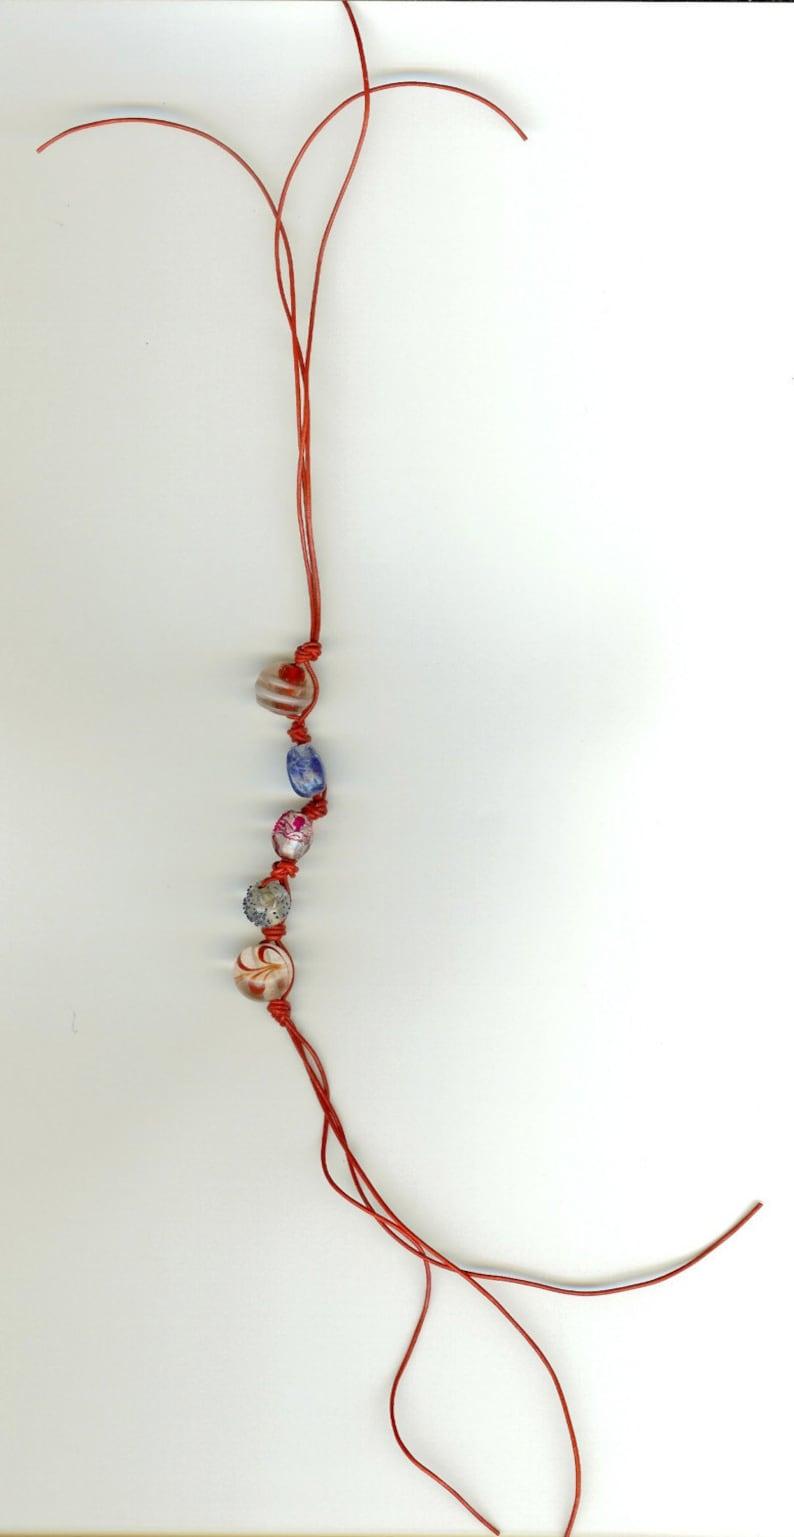 Leather Multi-Colored Beaded Ankle BraceletBracelet Patriotic